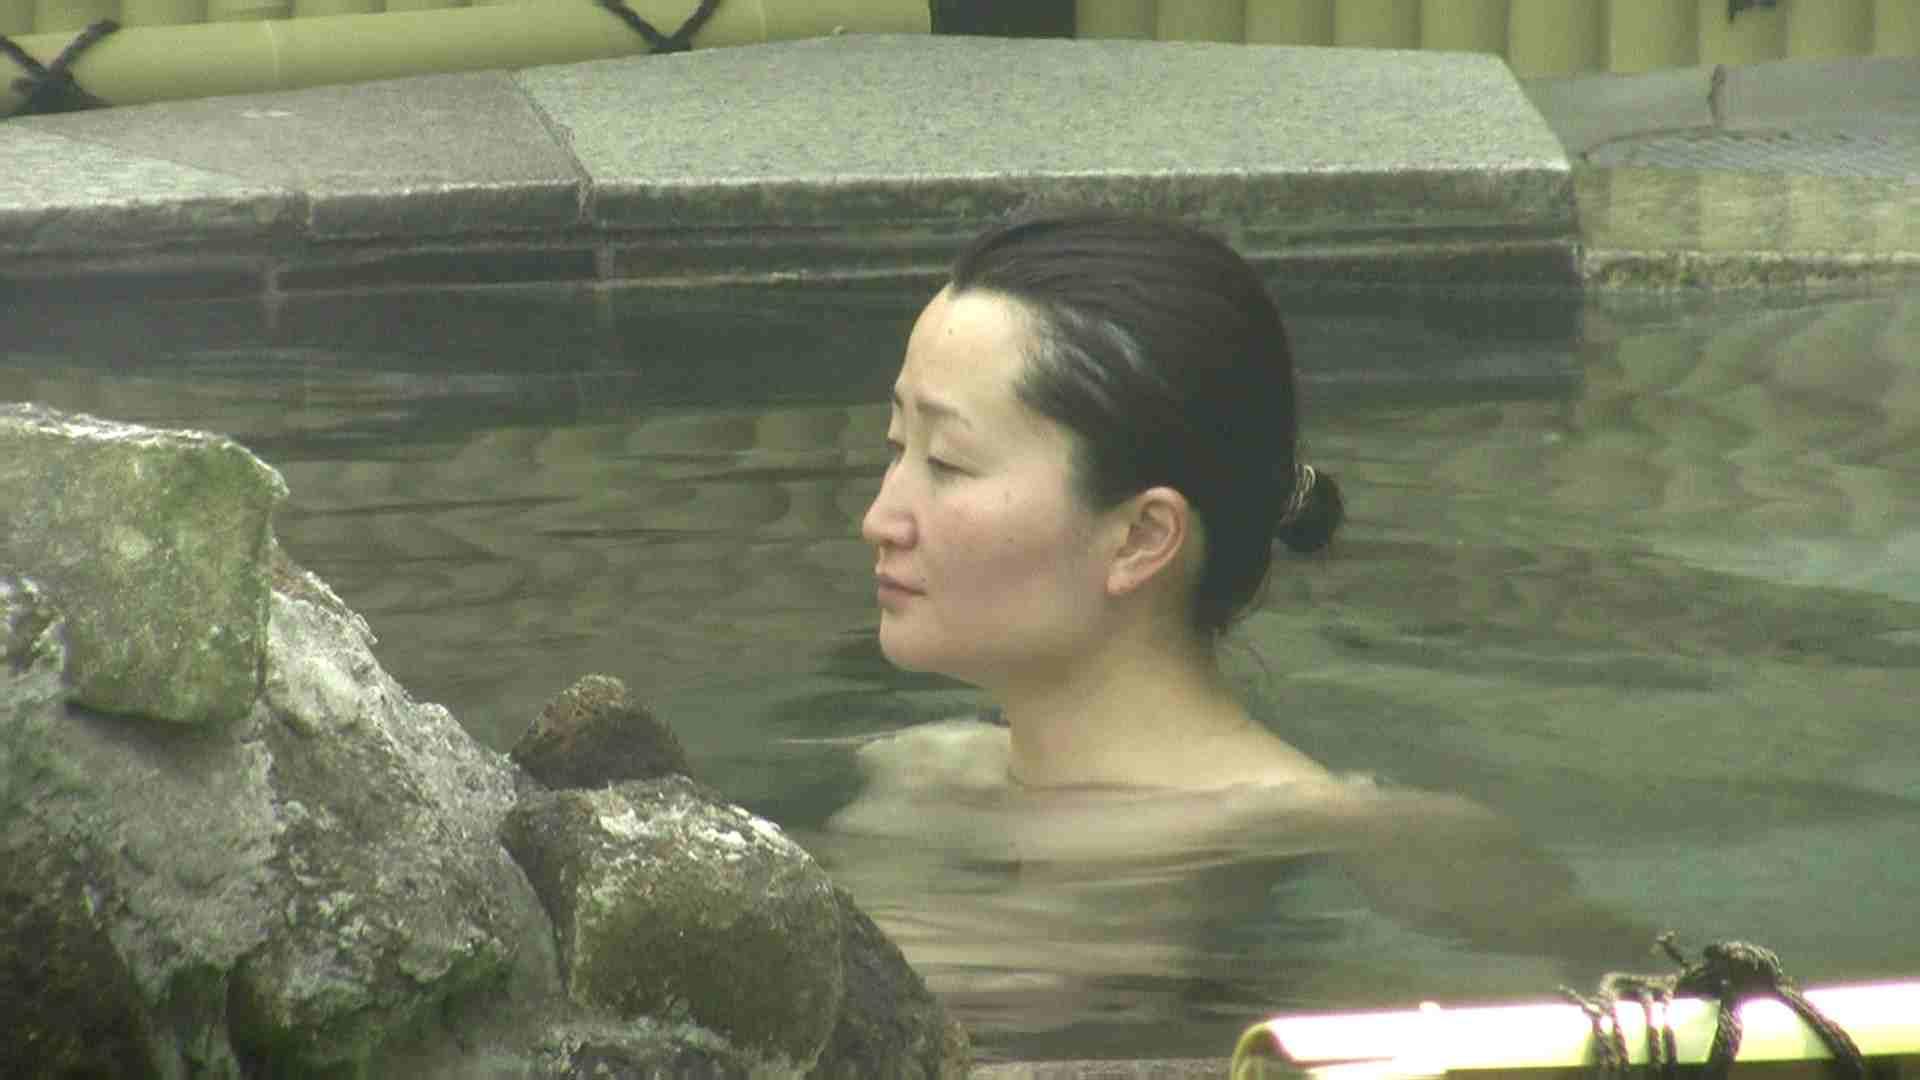 Aquaな露天風呂Vol.632 盗撮シリーズ | 露天風呂編  100PIX 47